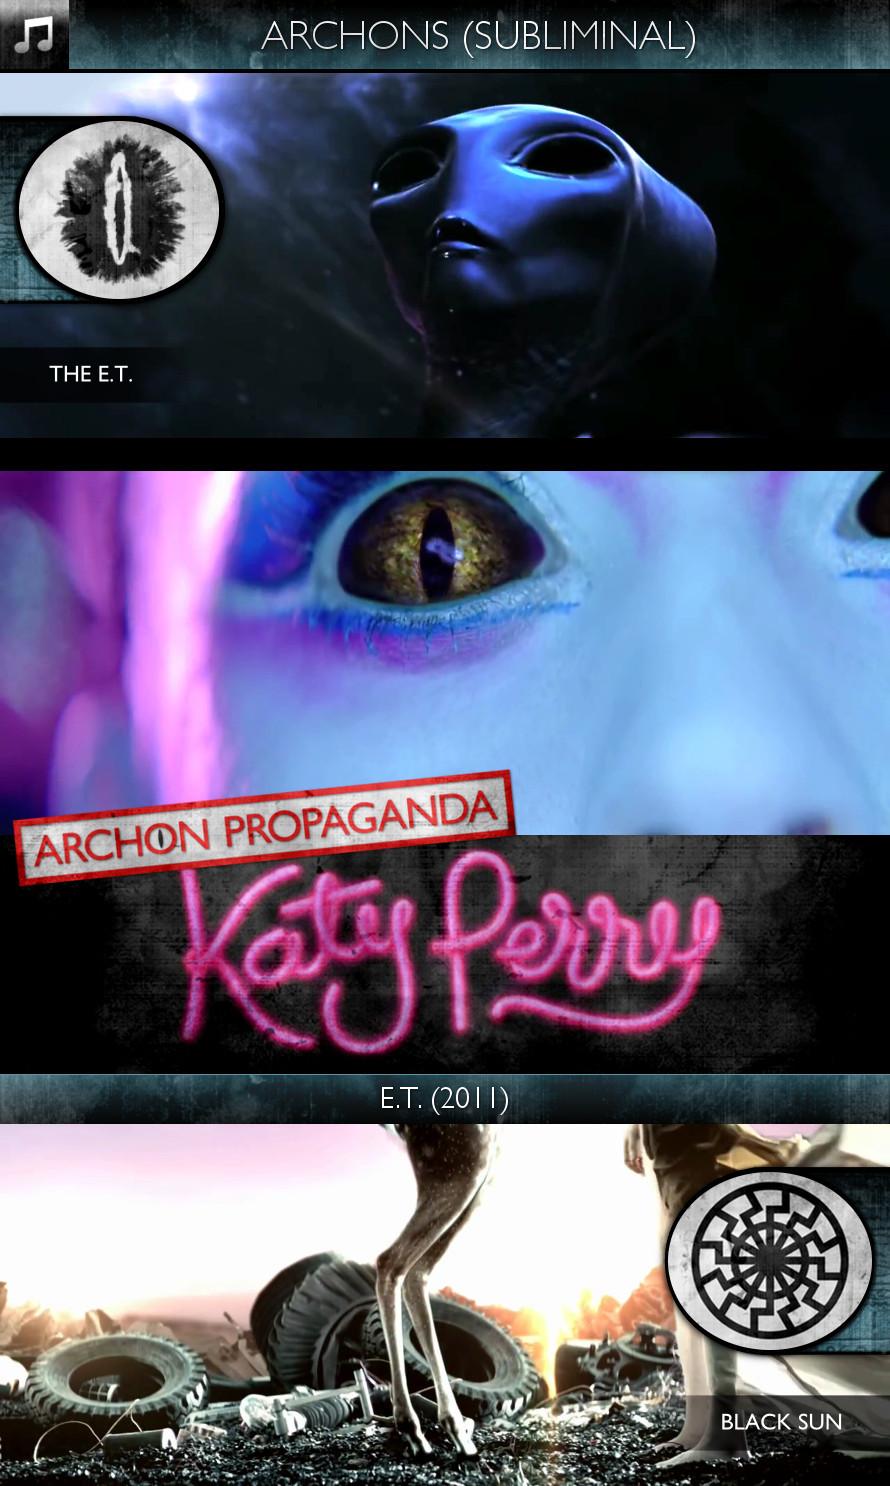 Katy Perry - E.T. (2011) - Archons - The E.T. - Subliminal